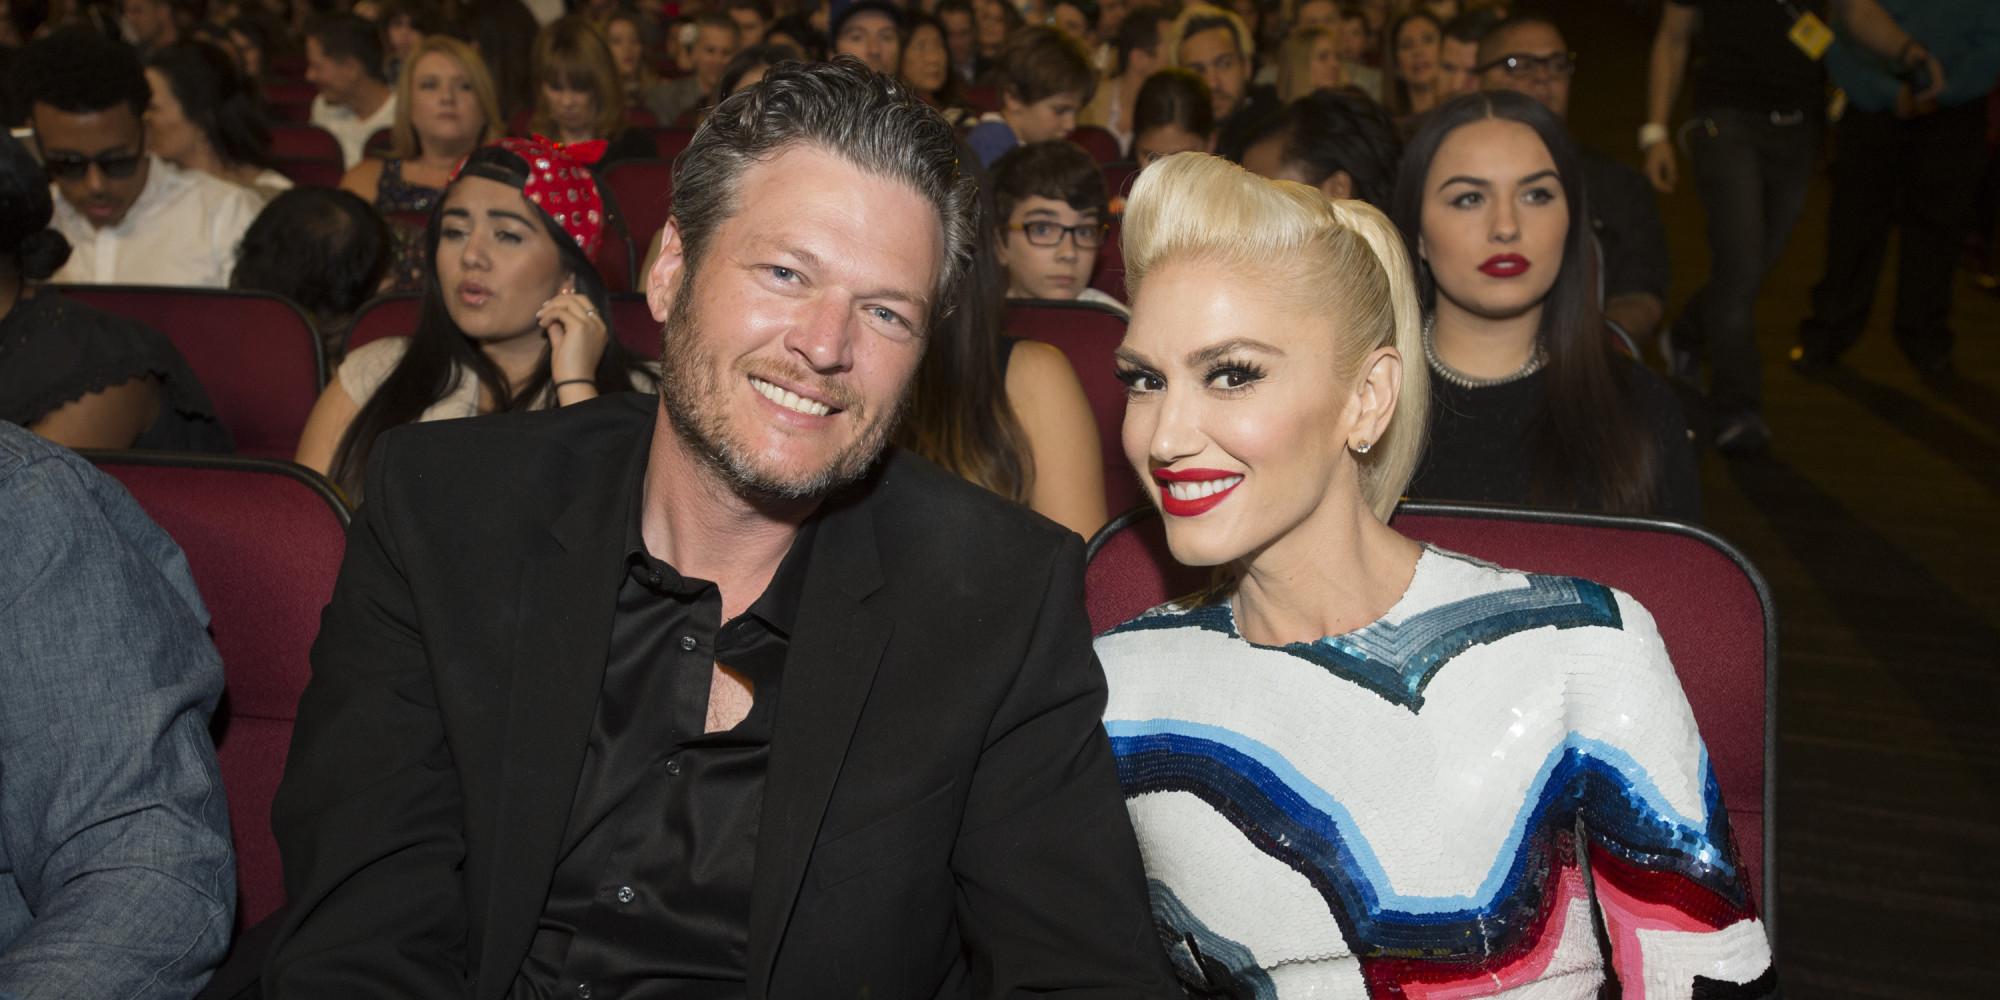 Gwen Stefani 'Went White' When Blake Shelton Revealed His Divorce